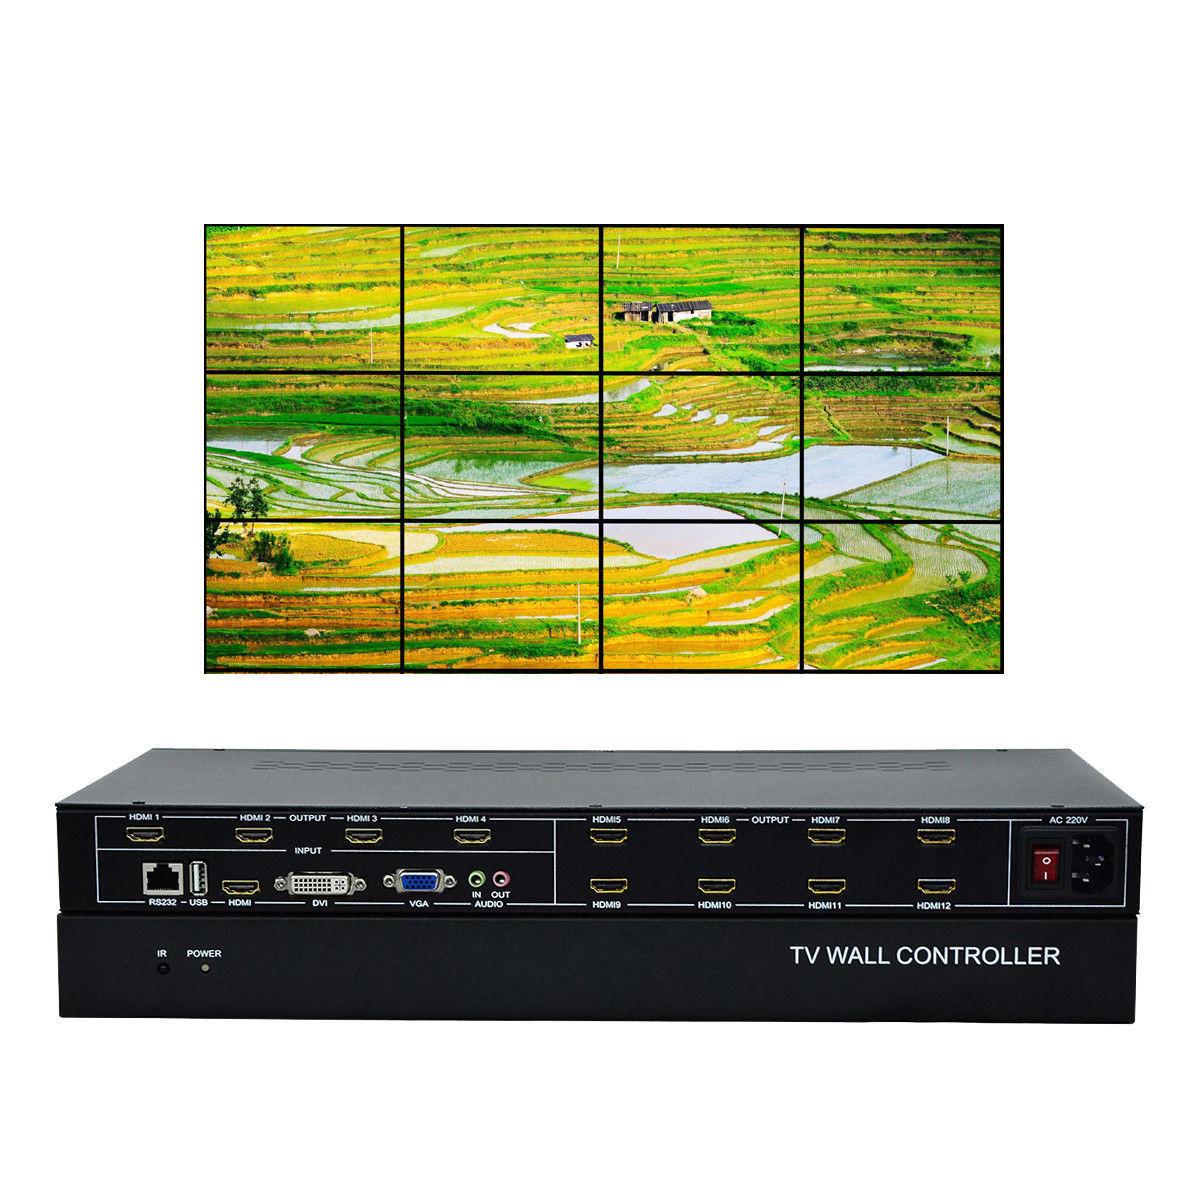 купить ESZYM 12 Channel TV Video Wall Controller 3x4 2x6 2x5 HDMI DVI VGA USB Video Processor по цене 83912.31 рублей